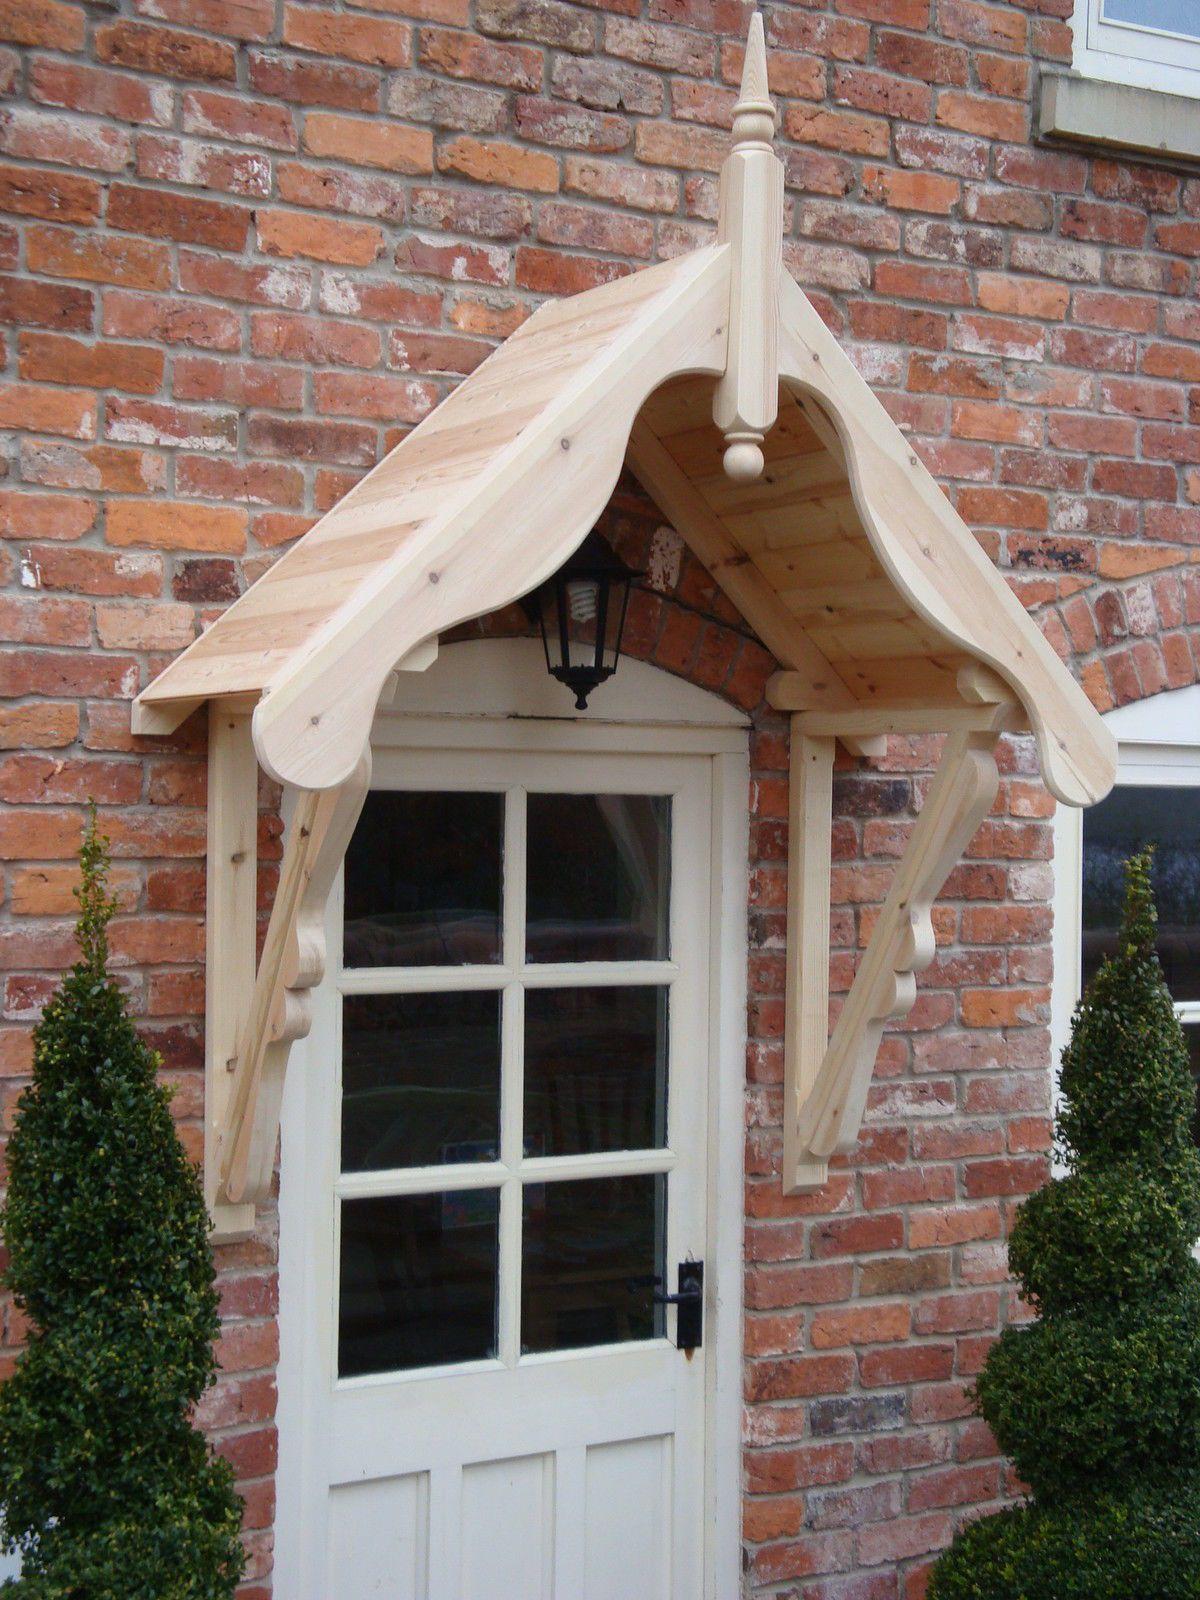 Timber Front Door Canopy Porch 1050mm  LUDLOW gallows brackets canopy & Timber Front Door Canopy Porch 1050mm